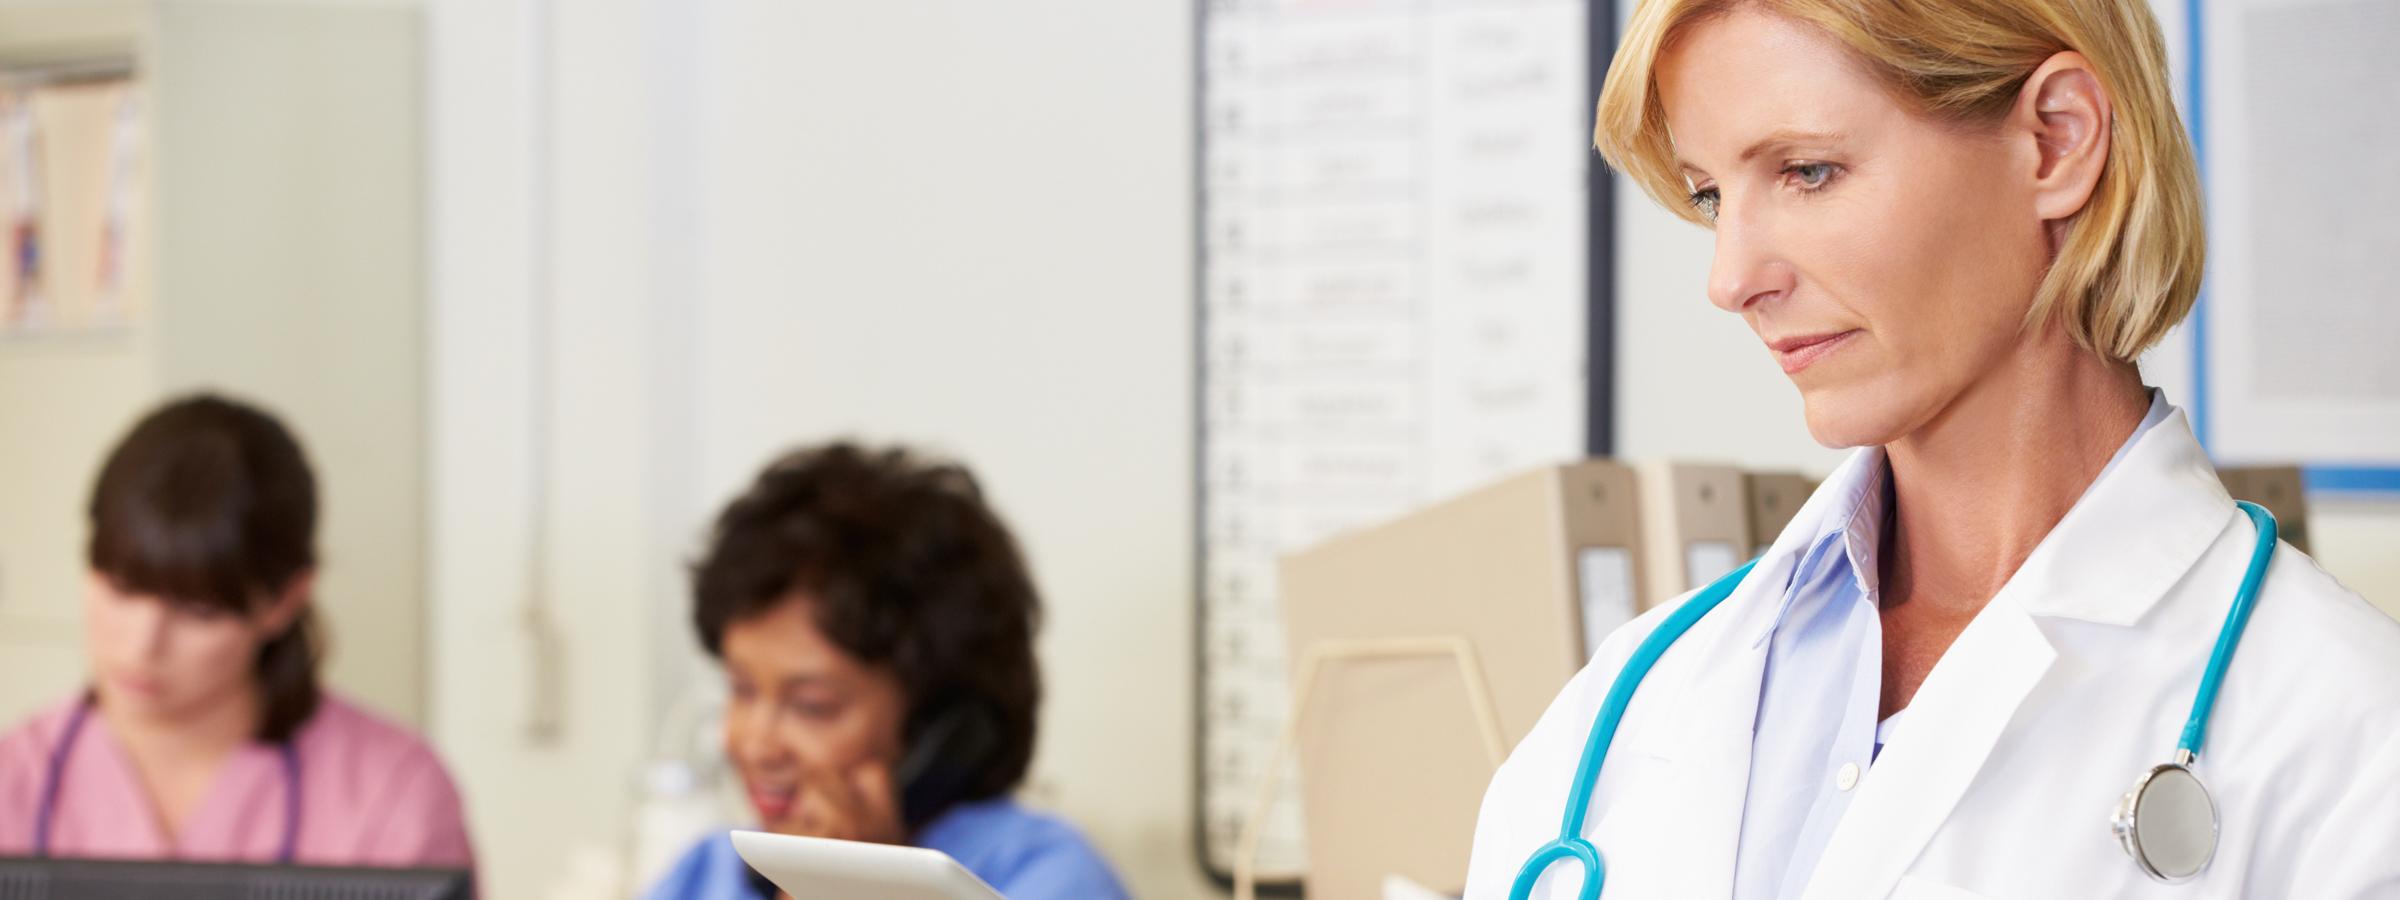 Female Doctor Using Digital Tablet At Nurses Station